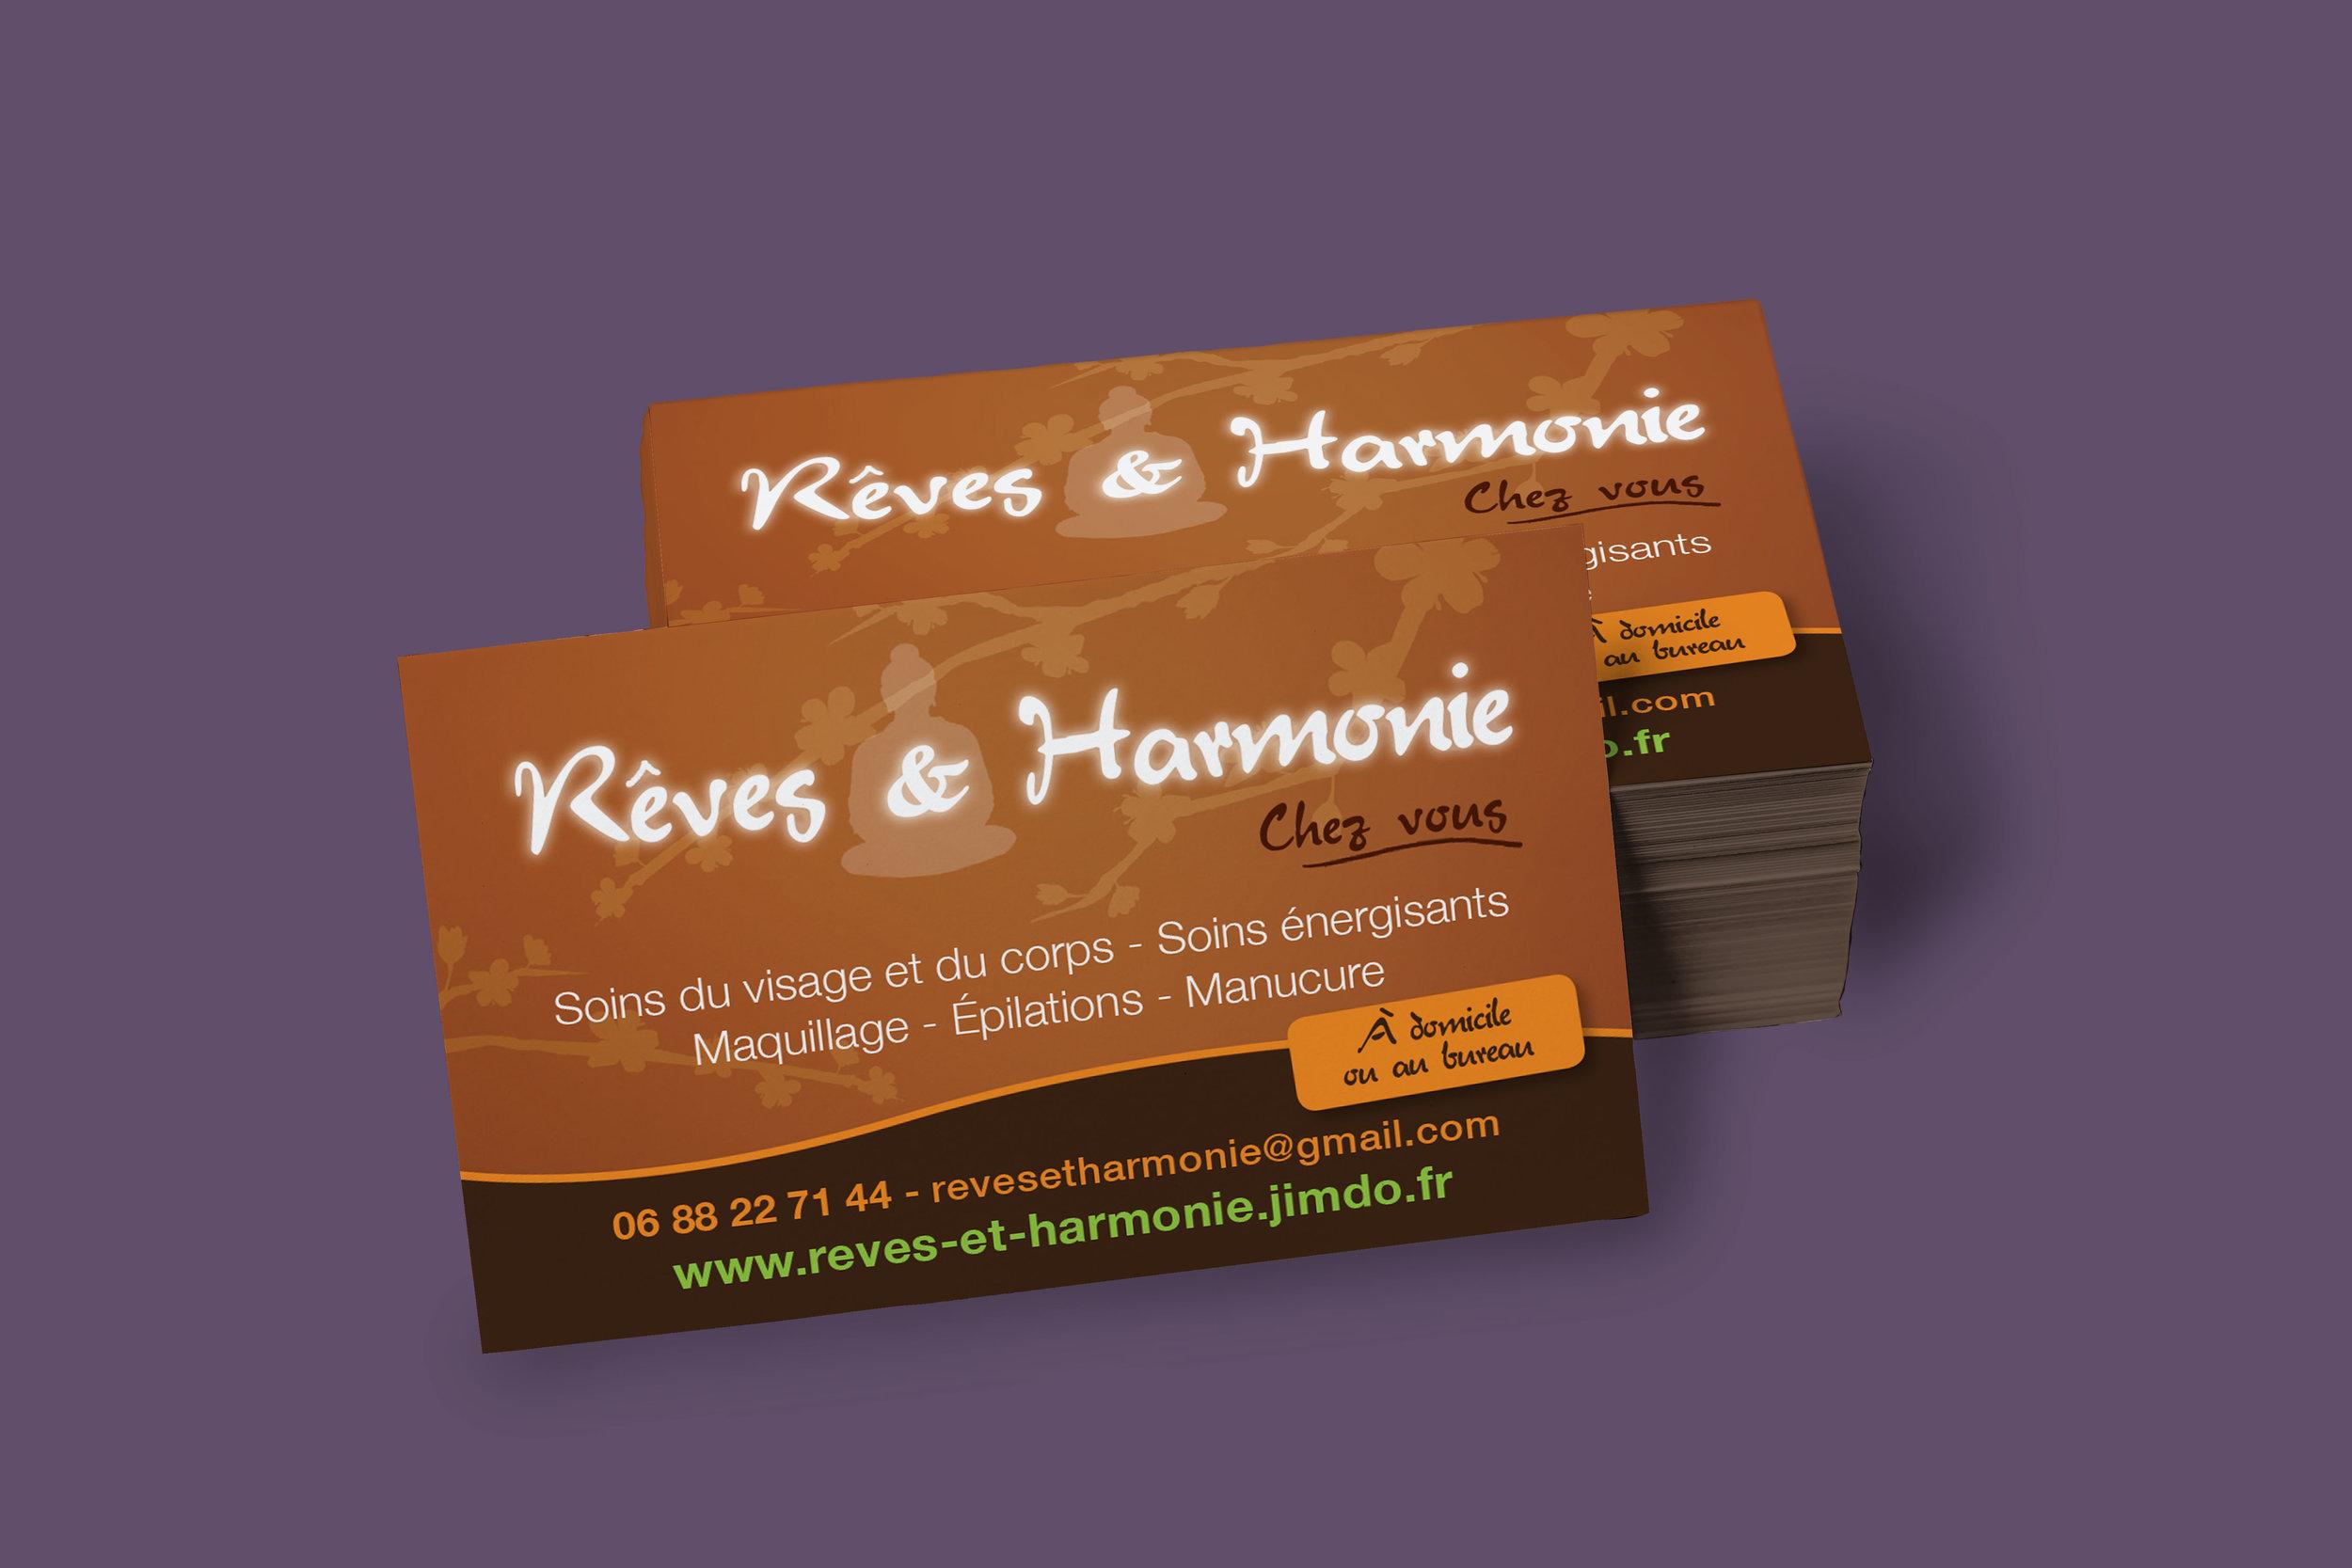 Creative-Pulse-reves-harmonie-Cartes-de-visite.jpg